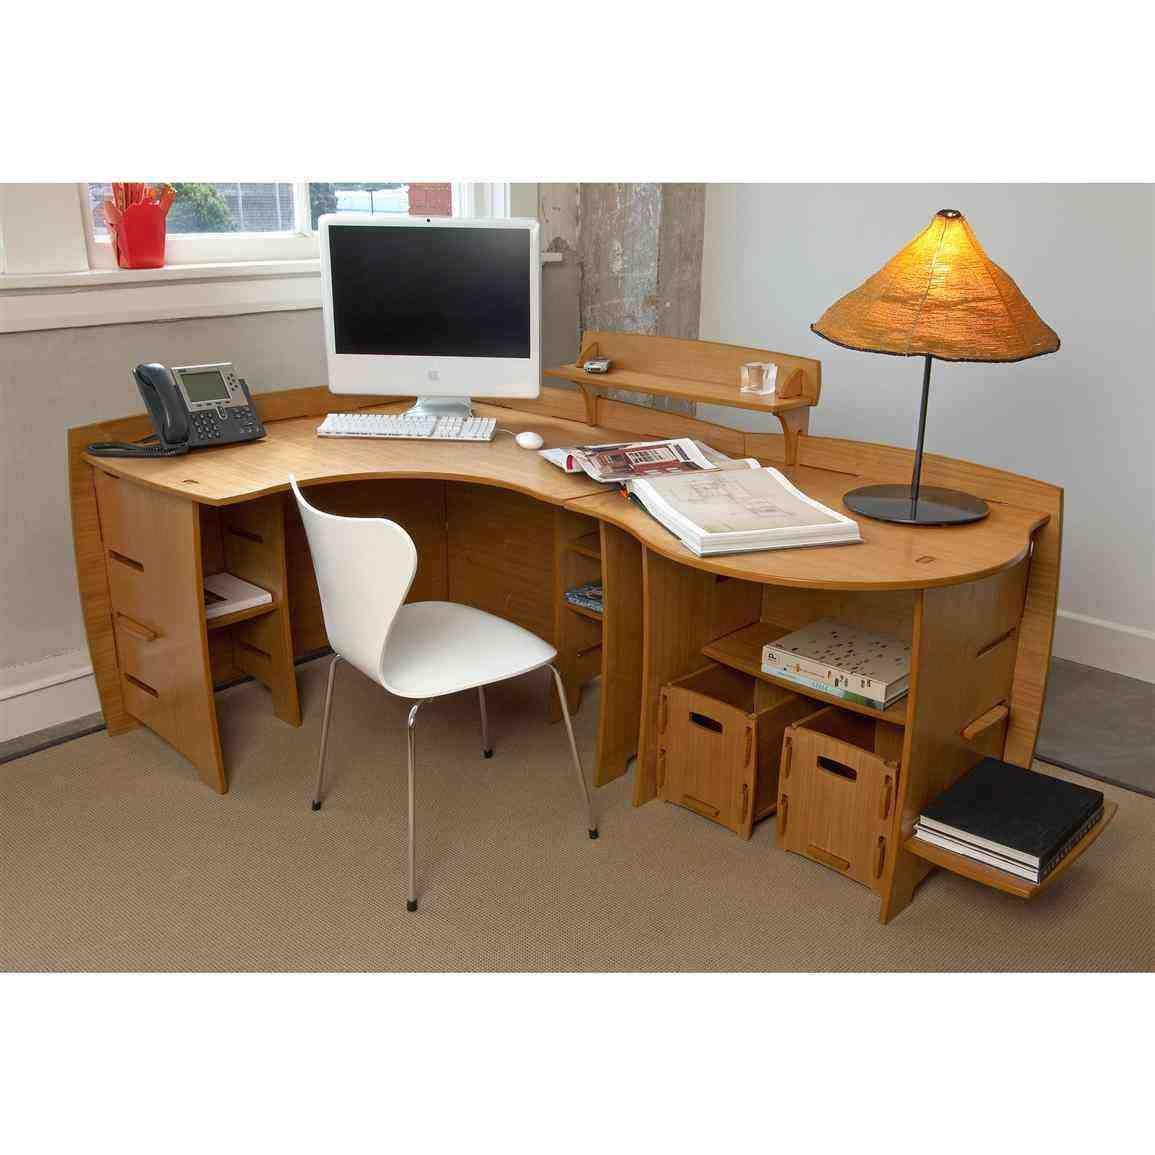 modular home office desk. Legare Desks And Office, Computer, Media Kids Furniture Modular Home Office Desk Pinterest